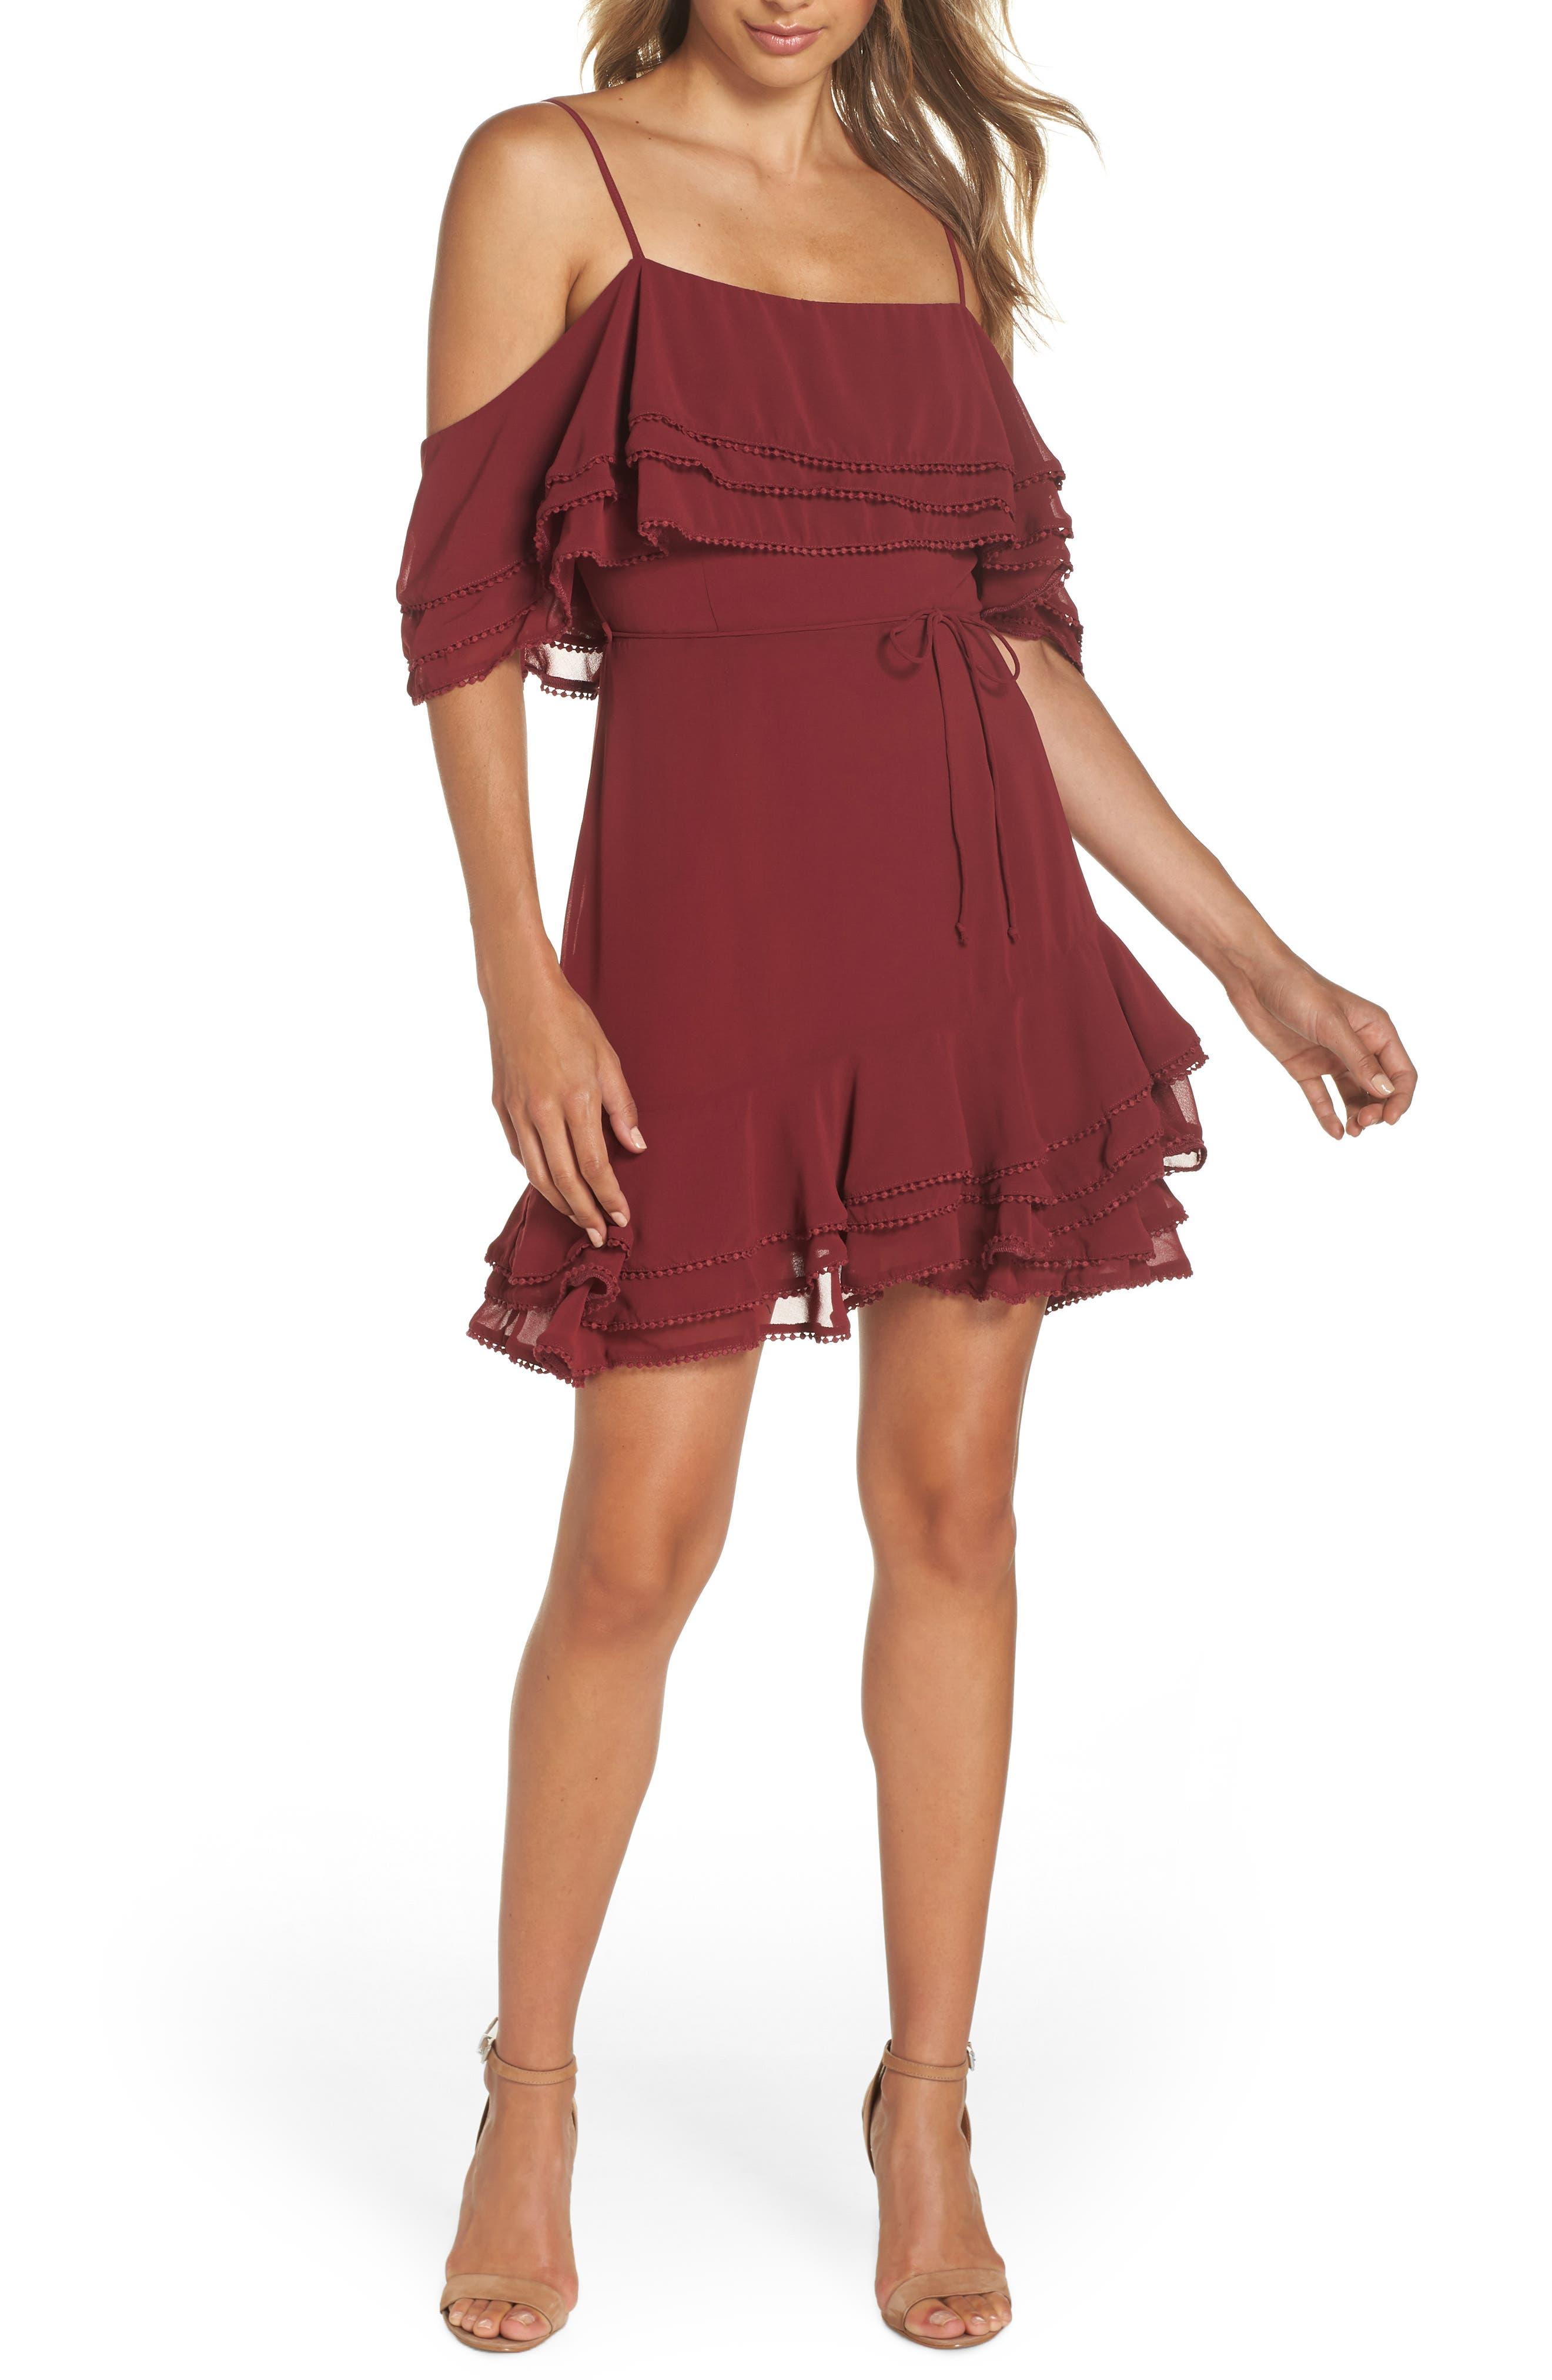 BB DAKOTA, Up All Night Layered Cold Shoulder Dress, Main thumbnail 1, color, 930